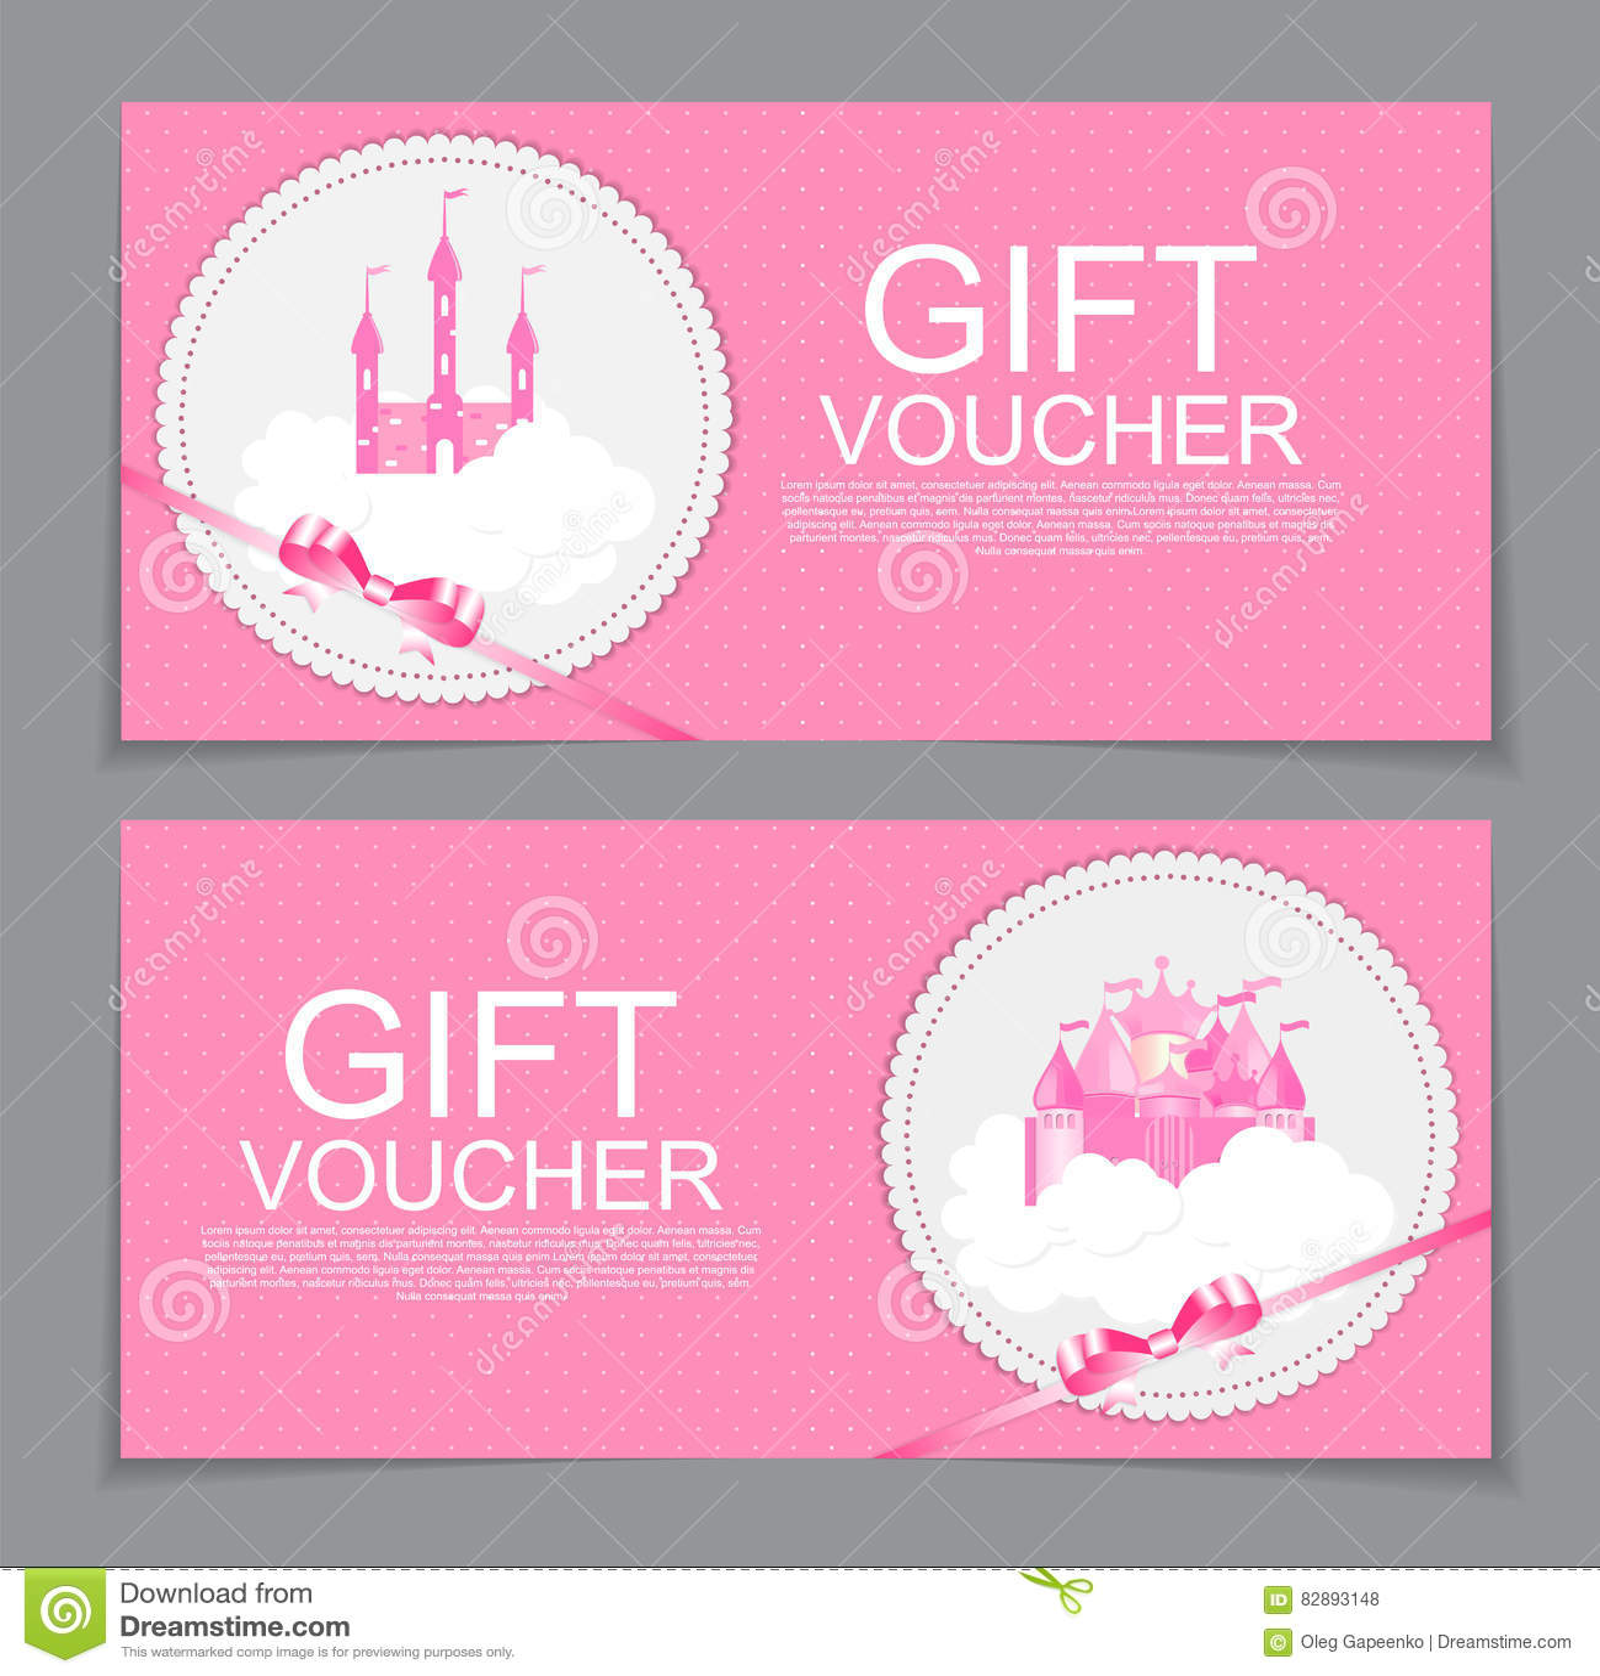 Baby Gift Voucher Template. Vector Illustration. Stock Vector .